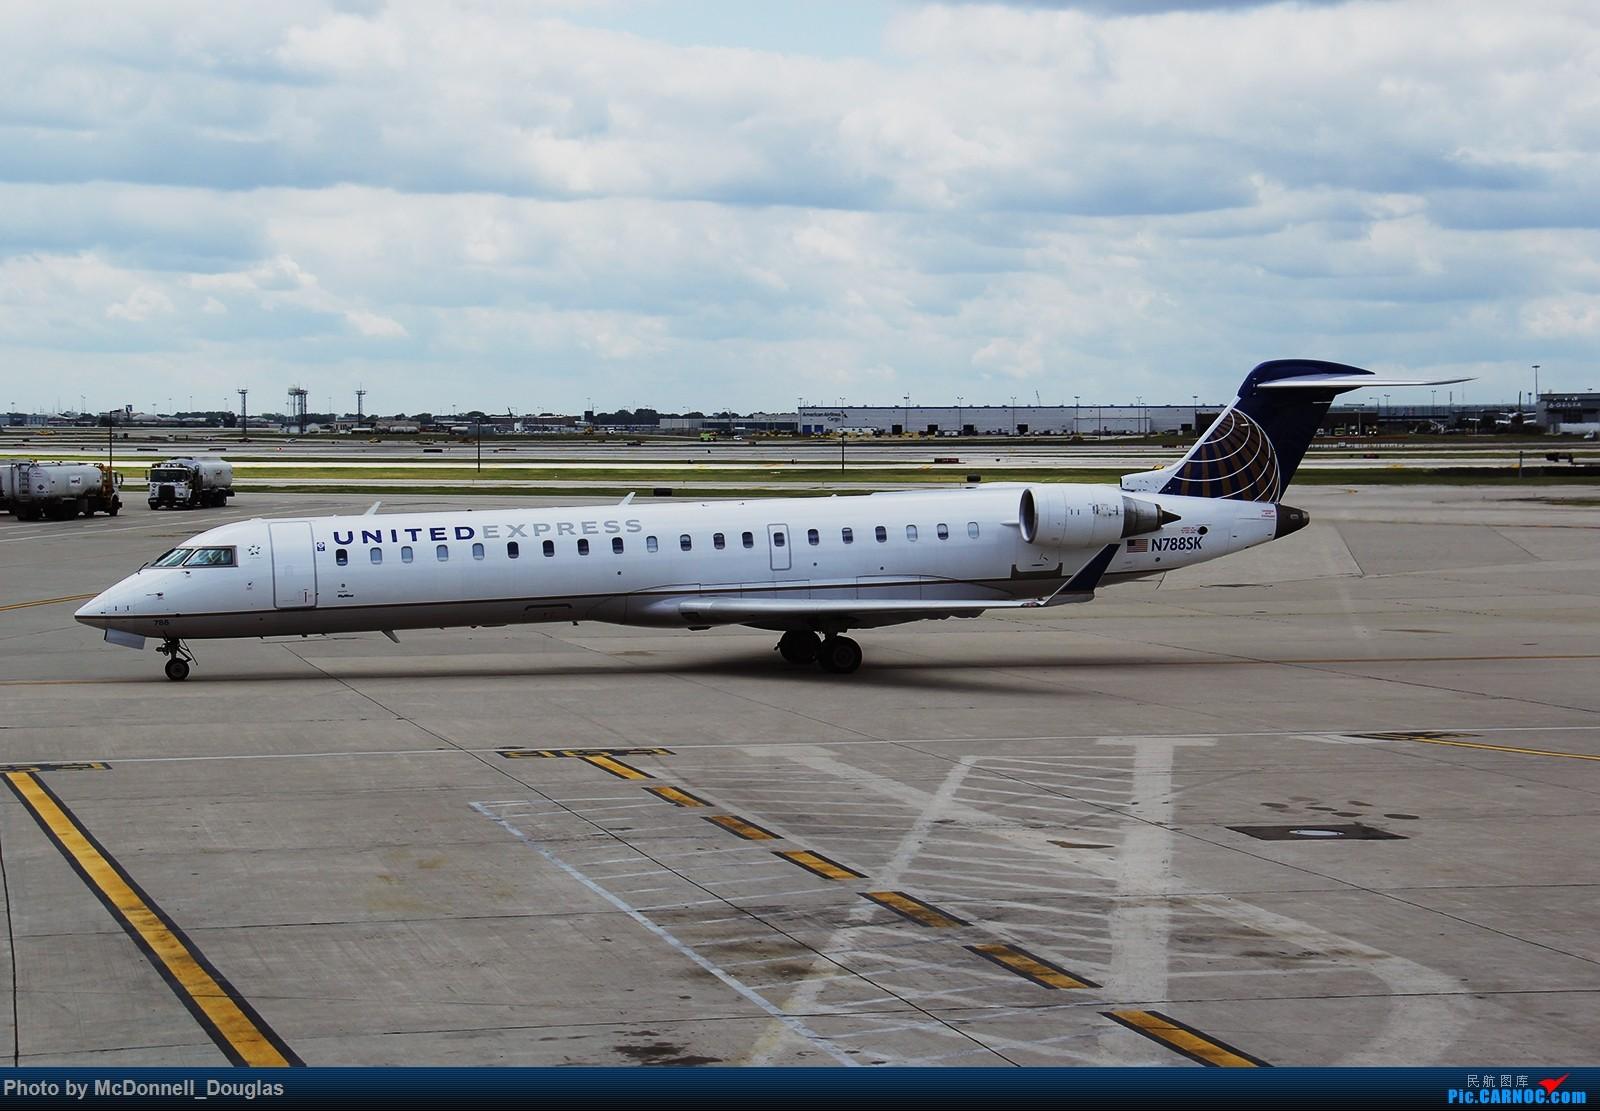 Re:[原创]【上海飞友会】图会很多,也有很多驾驶舱,杂七杂八的美帝,梦寐以求的圣马丁,这更绝不弃贴【驾驶舱已出现】 CANADAIR CL-600-2C10 REGIONAL JET CRJ-702ER N788SK 美国芝加哥奥黑尔国际机场